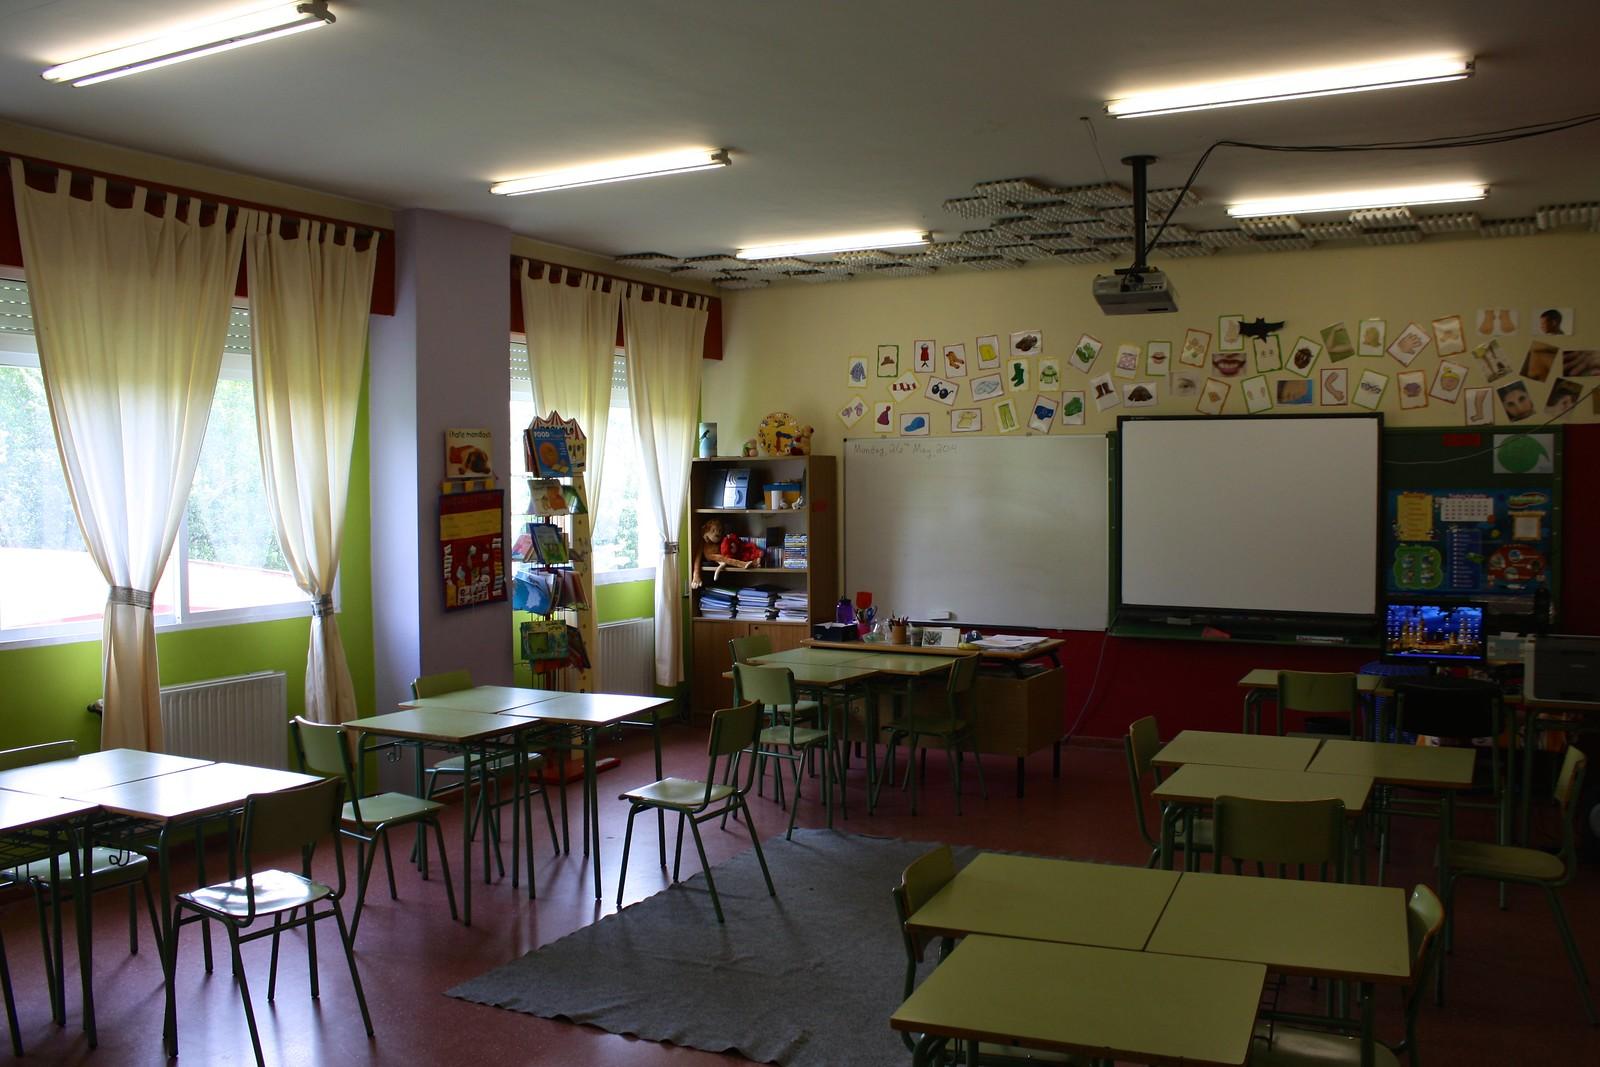 Culture shock at Spanish school